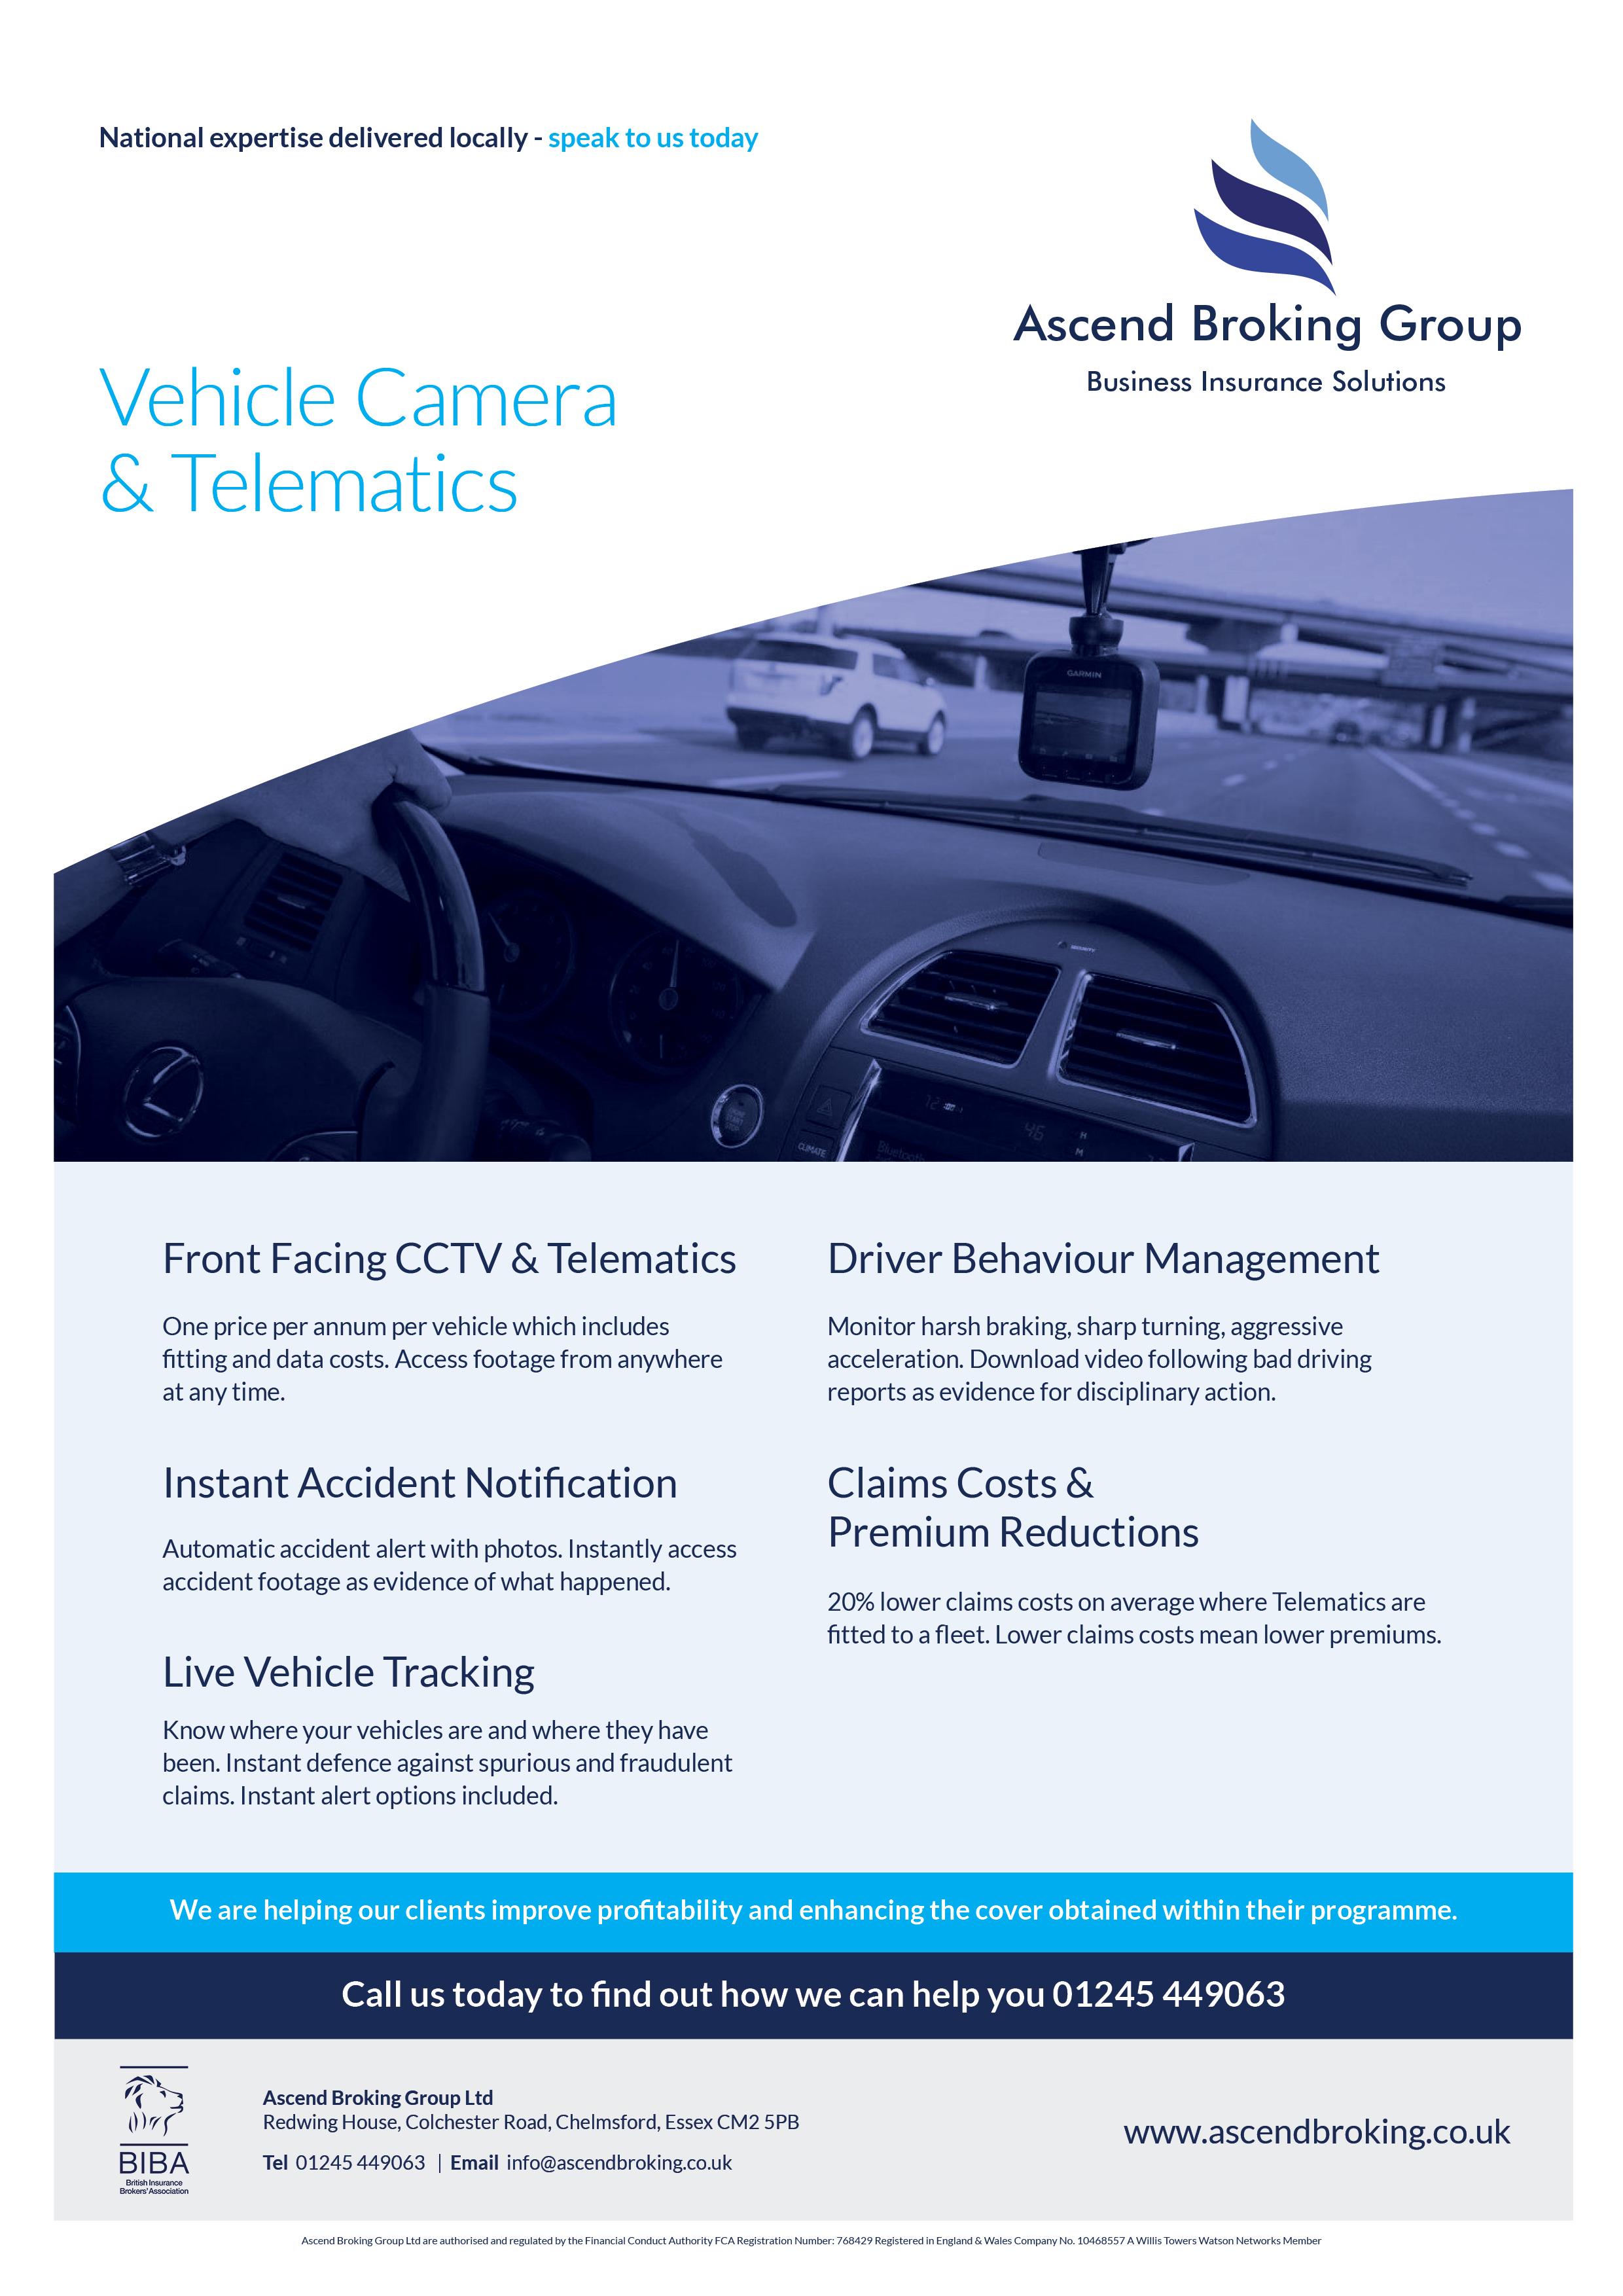 Vehicle Camera & Telematics